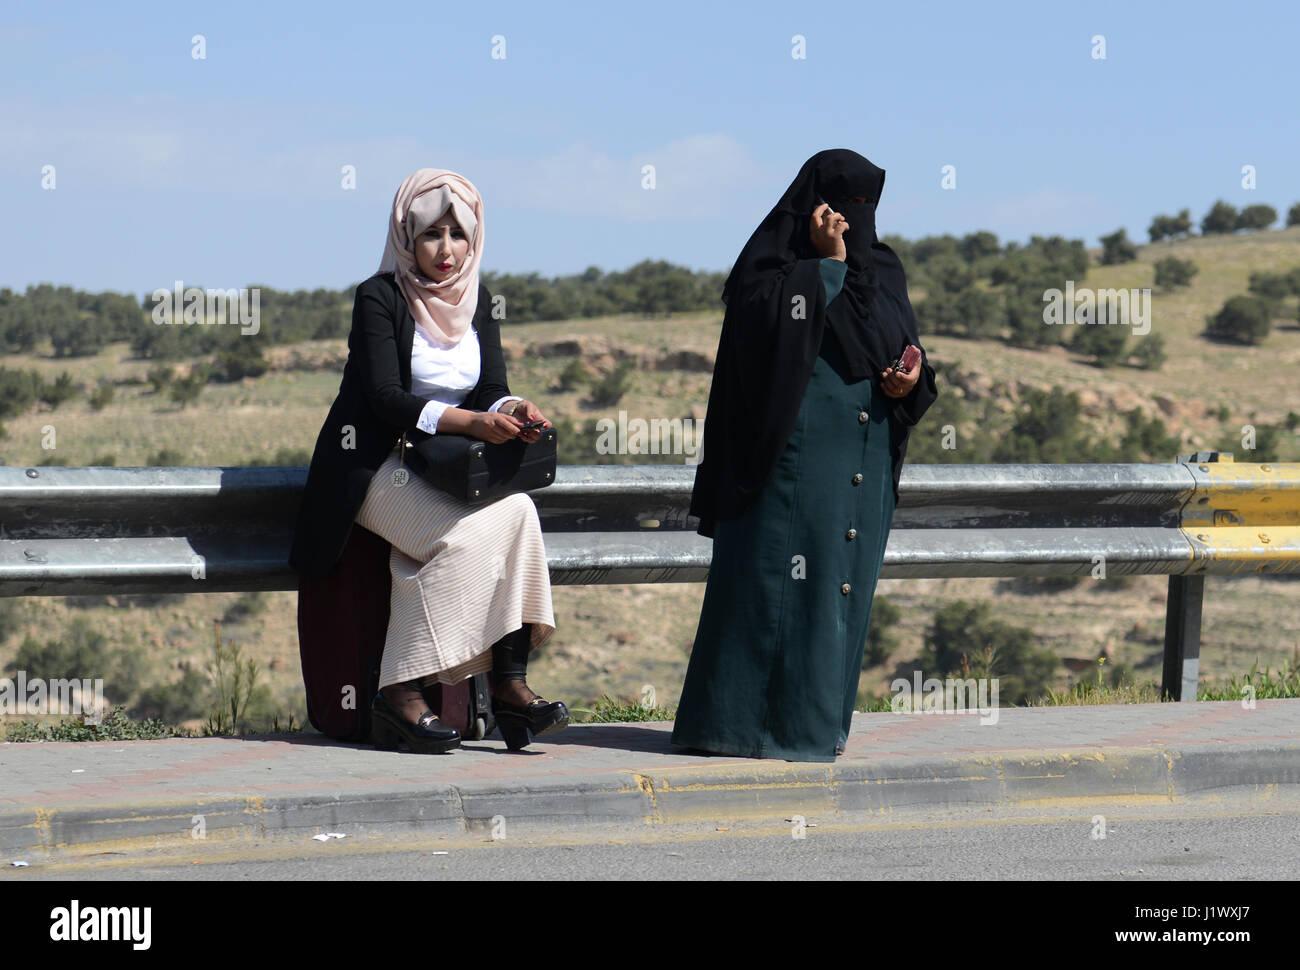 Jordanian women wating for the bus in a rural area in northern Jordan. - Stock Image